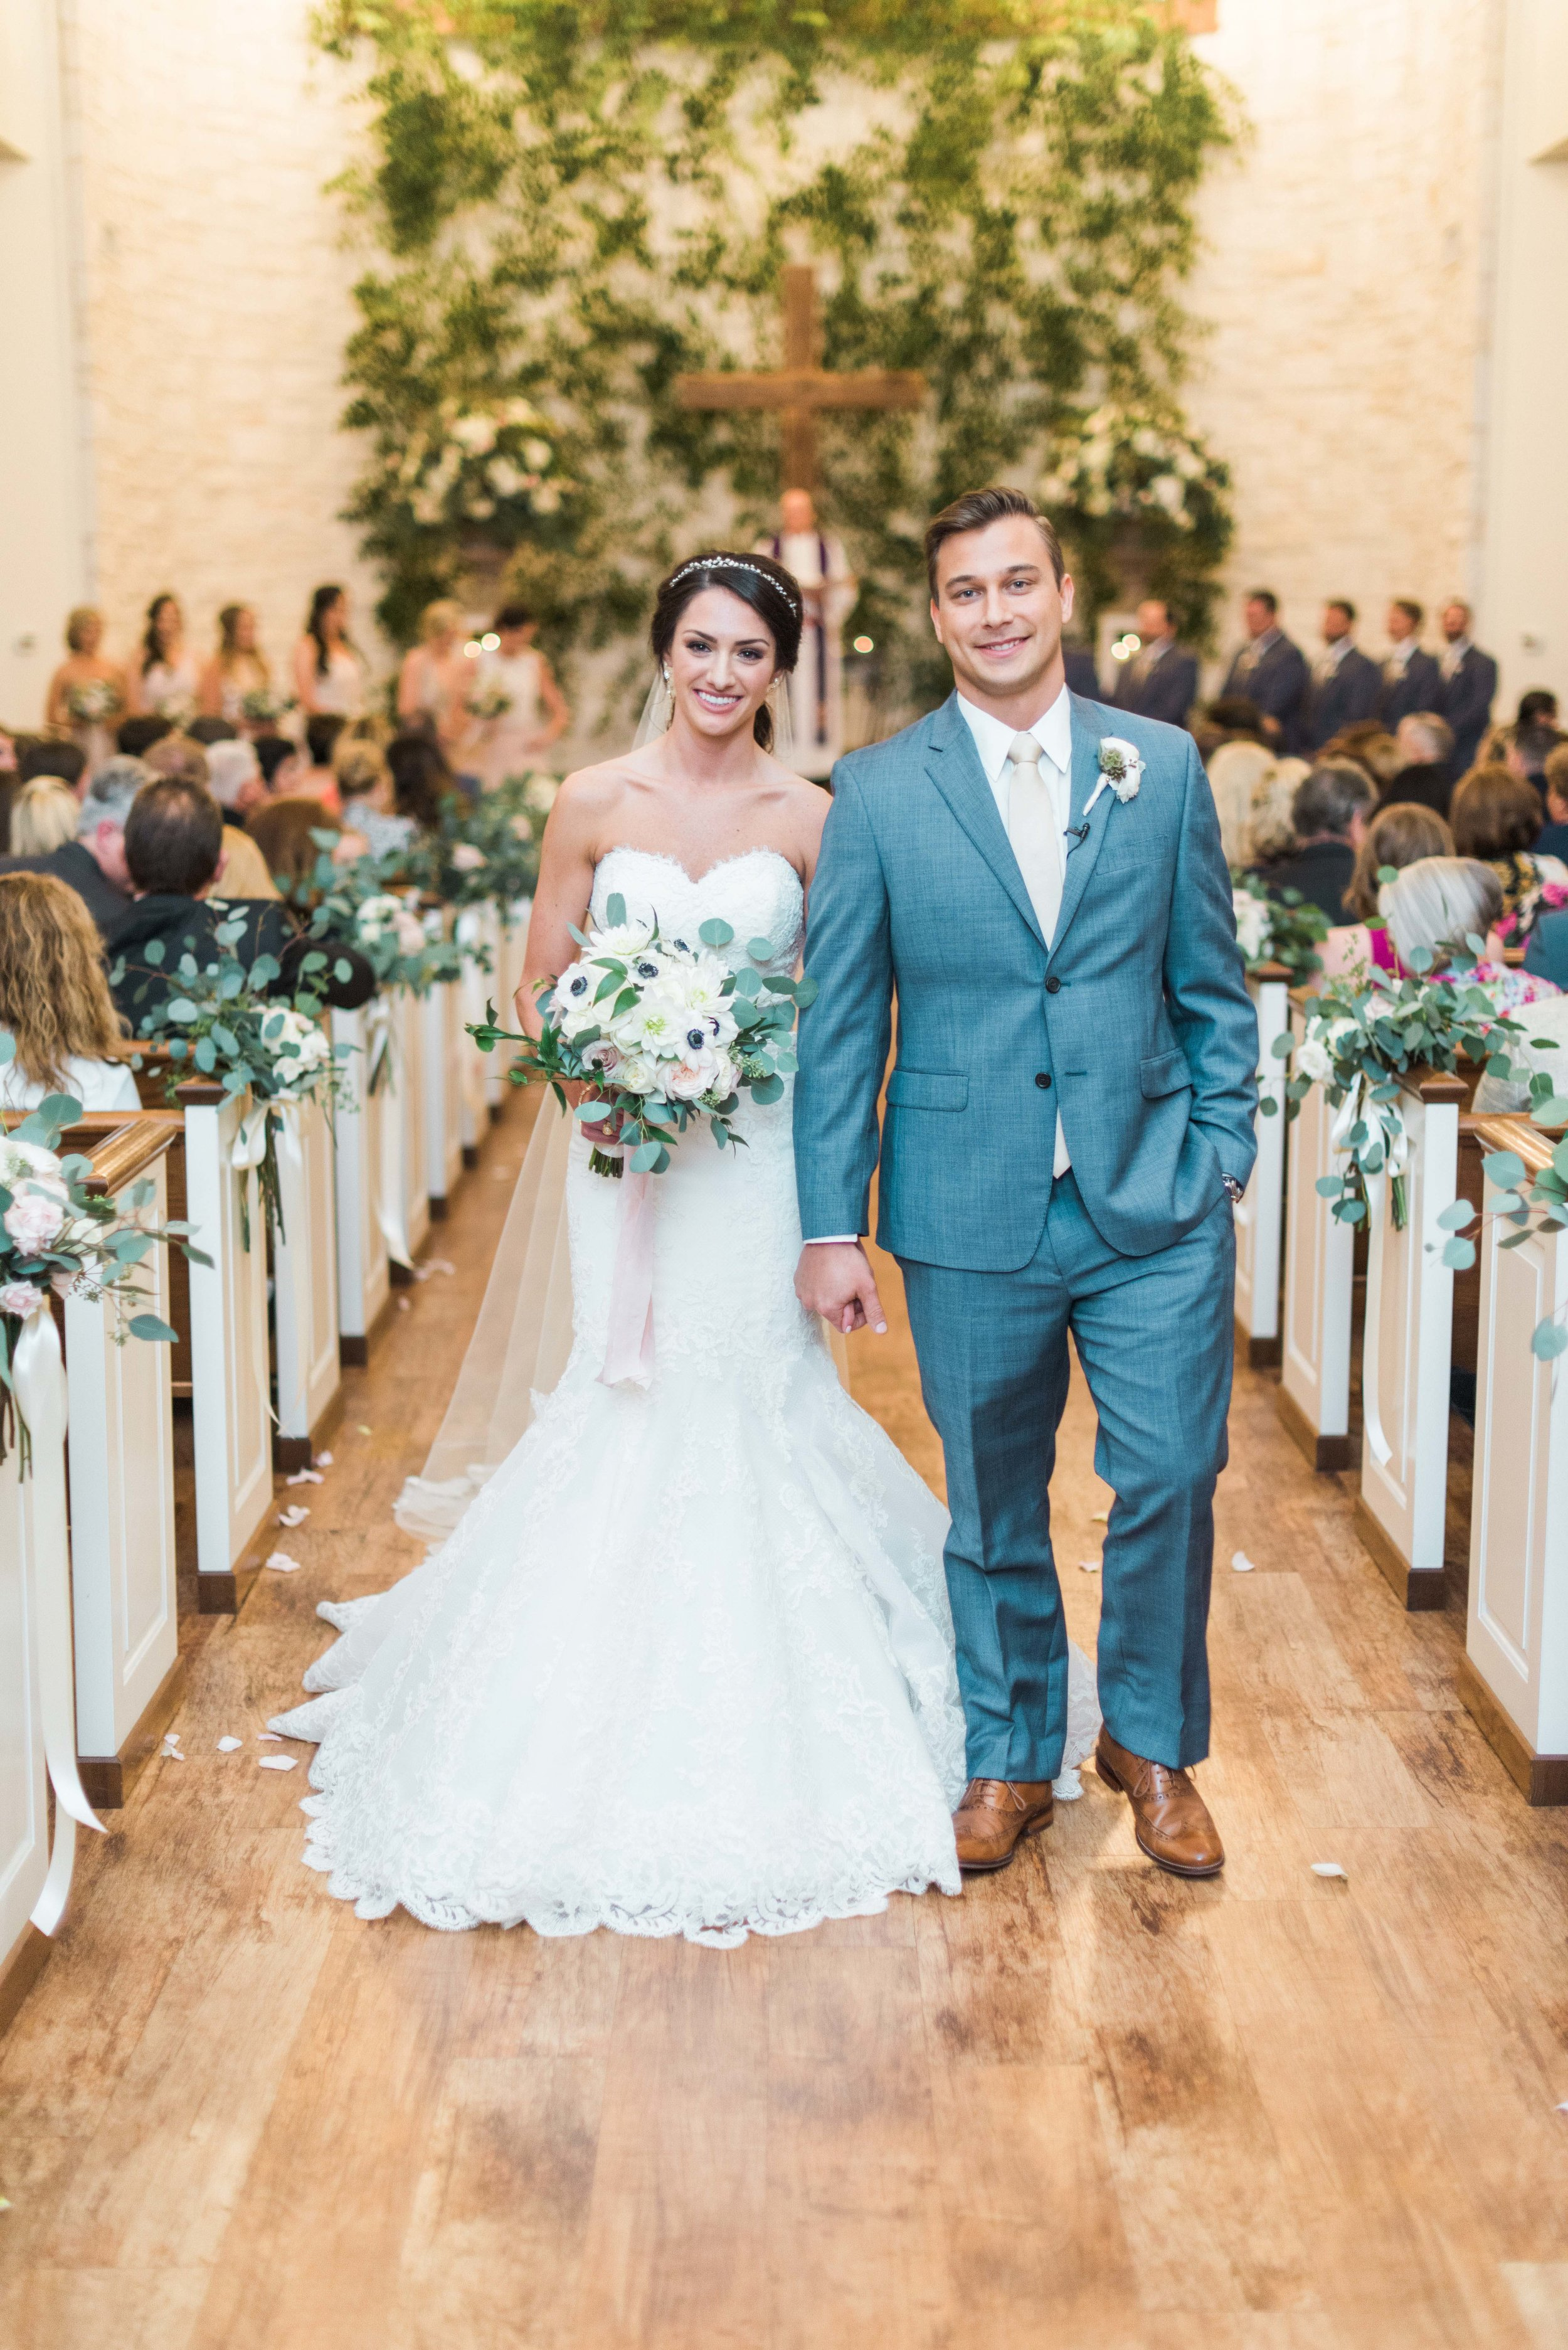 Briscoe-Manor-Houston-Wedding-Photographer-Modern-Luxury-Weddings-Dana-Fernandez-Photograpy-Fine-Art-Photographer-Houston-Film-Destination-PNW-Wedding-Photographer-21.jpg